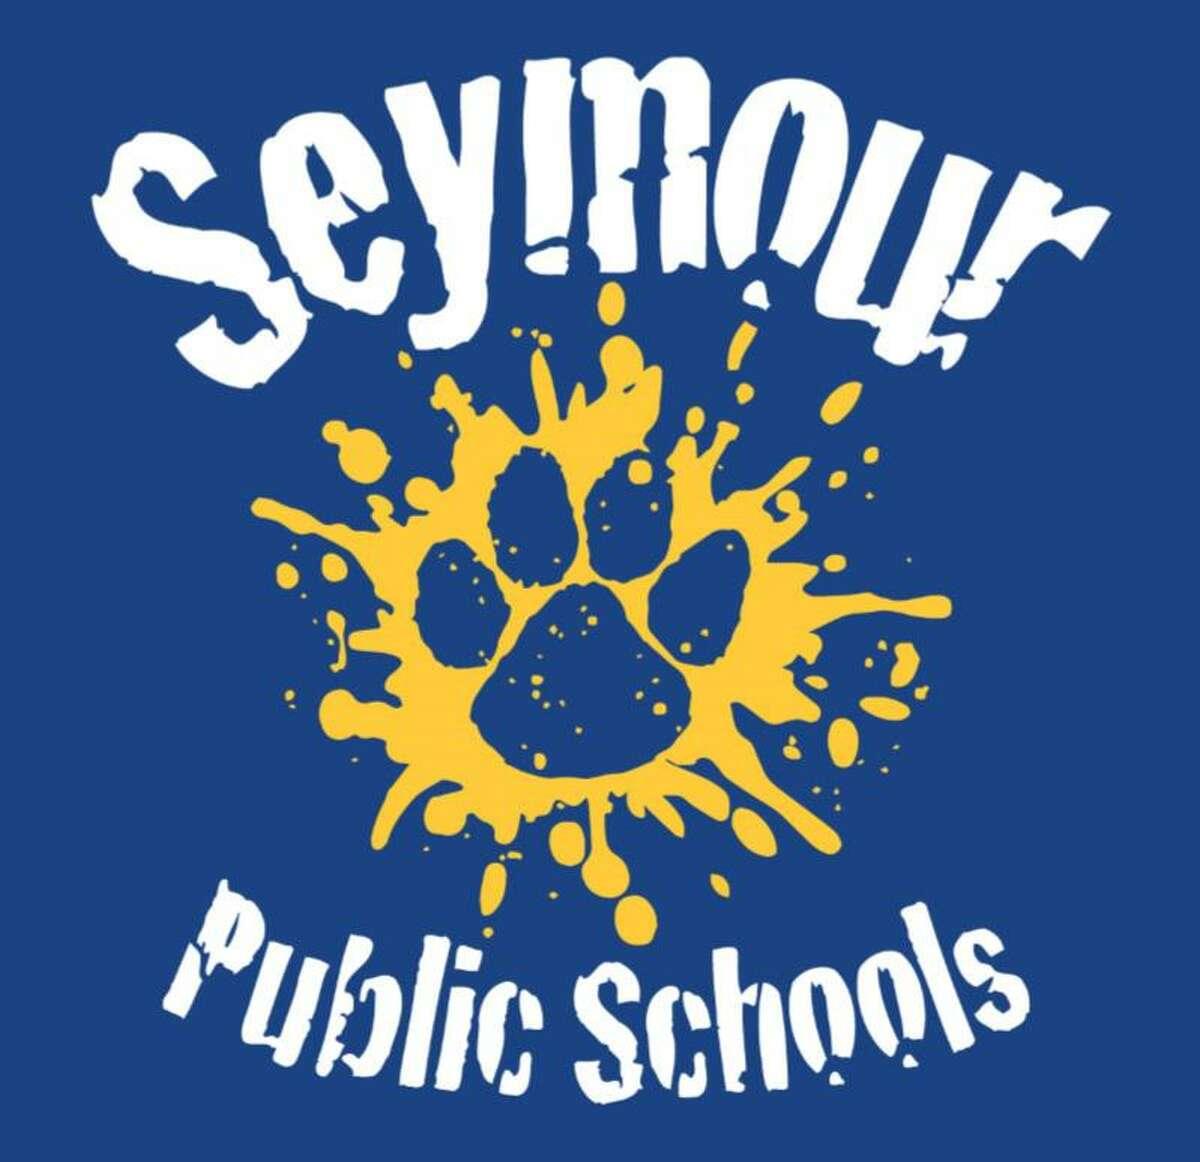 Seymour Public Schools